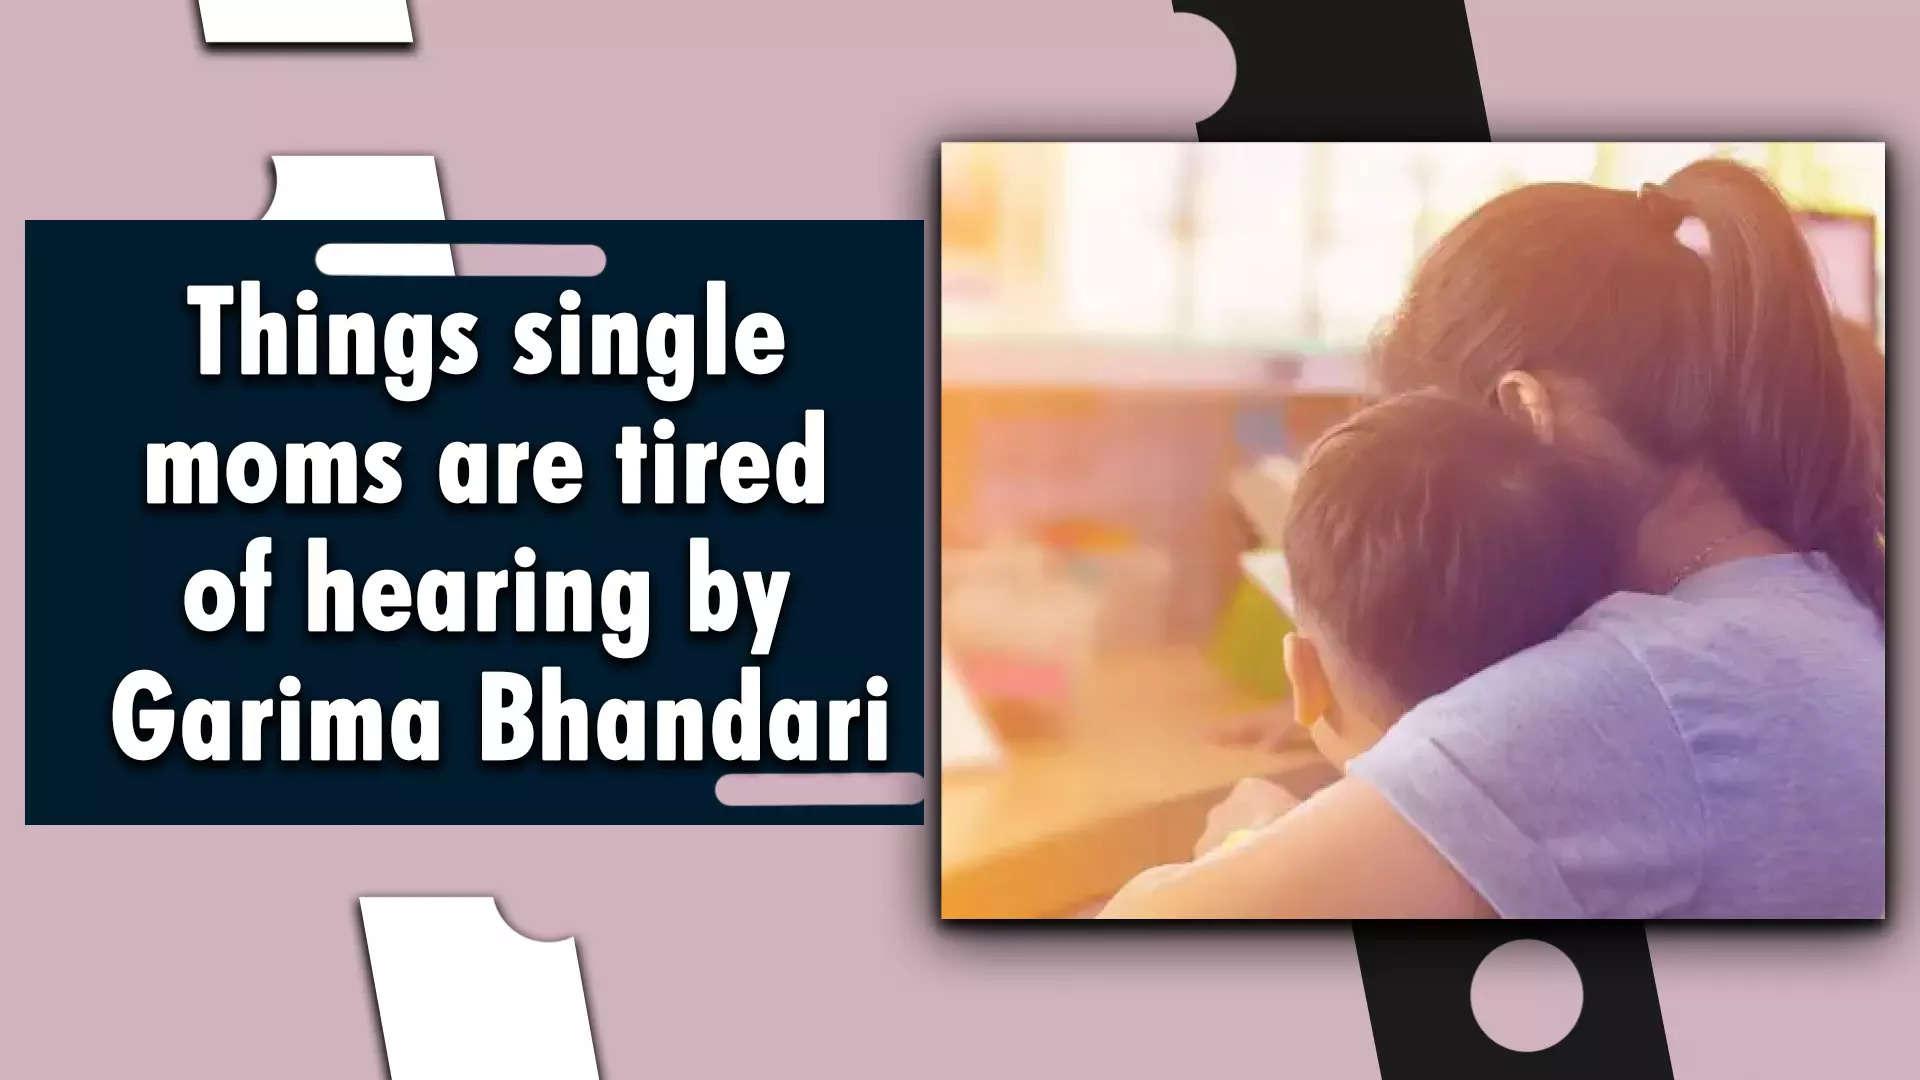 things-single-moms-are-tired-of-hearing-by-garima-bhandari